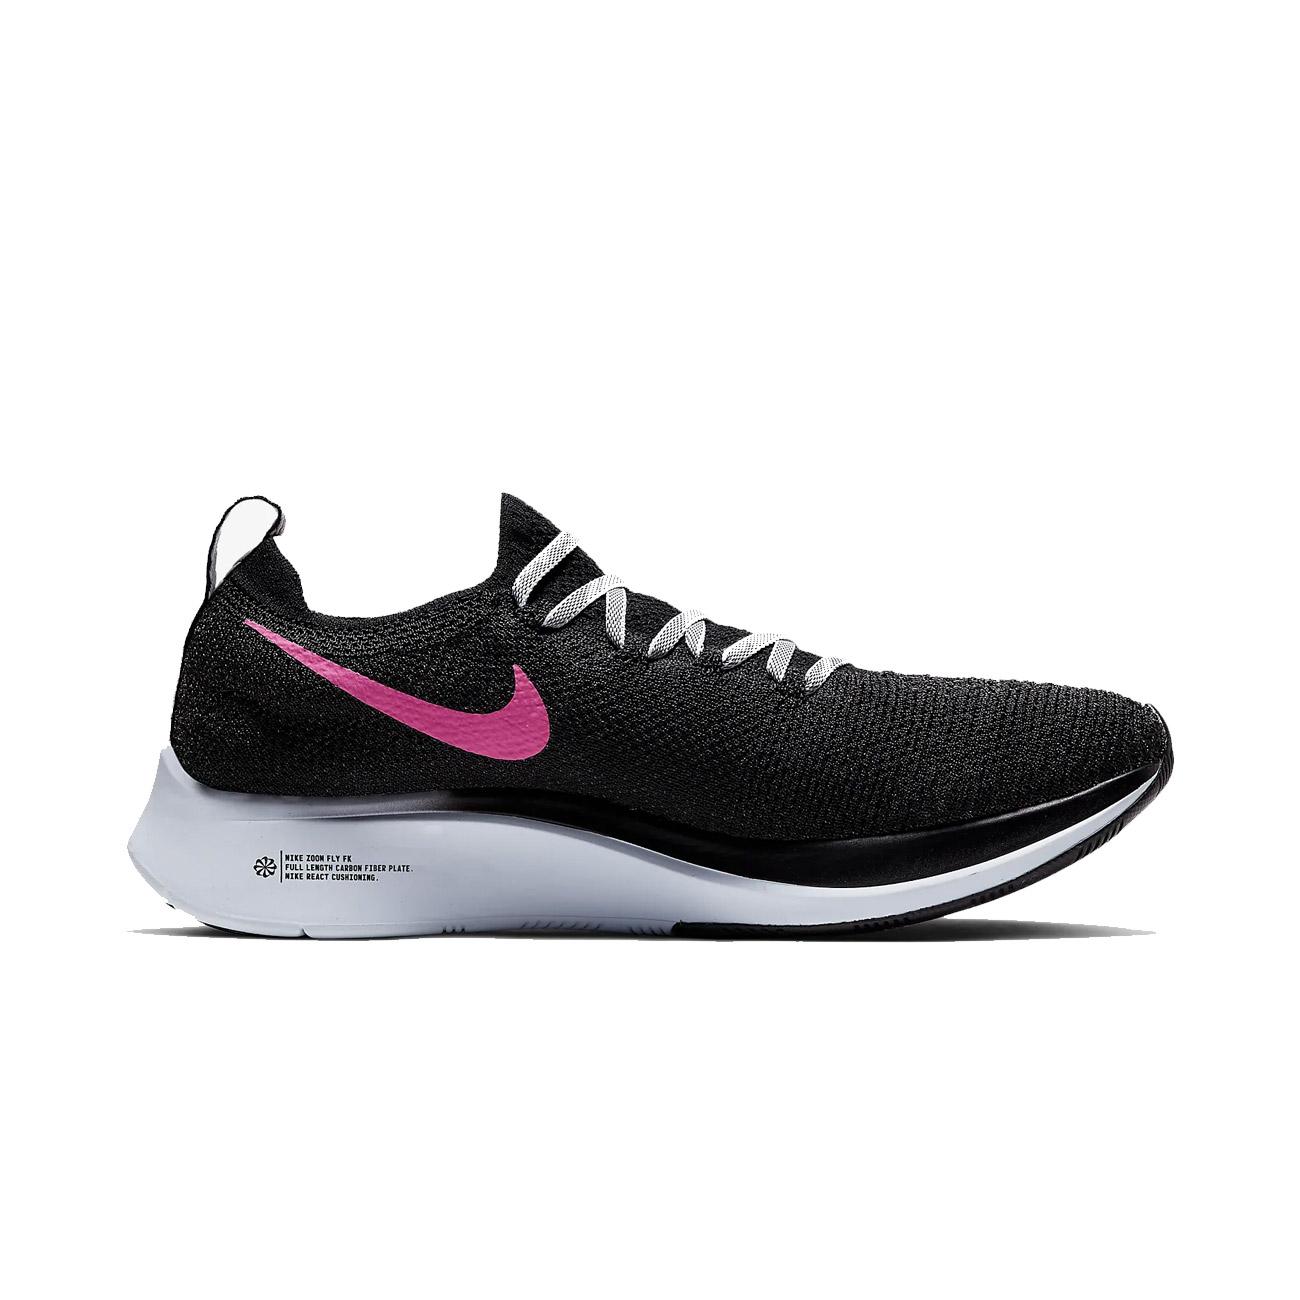 cheaper 28955 d294a Nike Zoom Women's Flyknit Running Shoes - Black/Hyper Pink